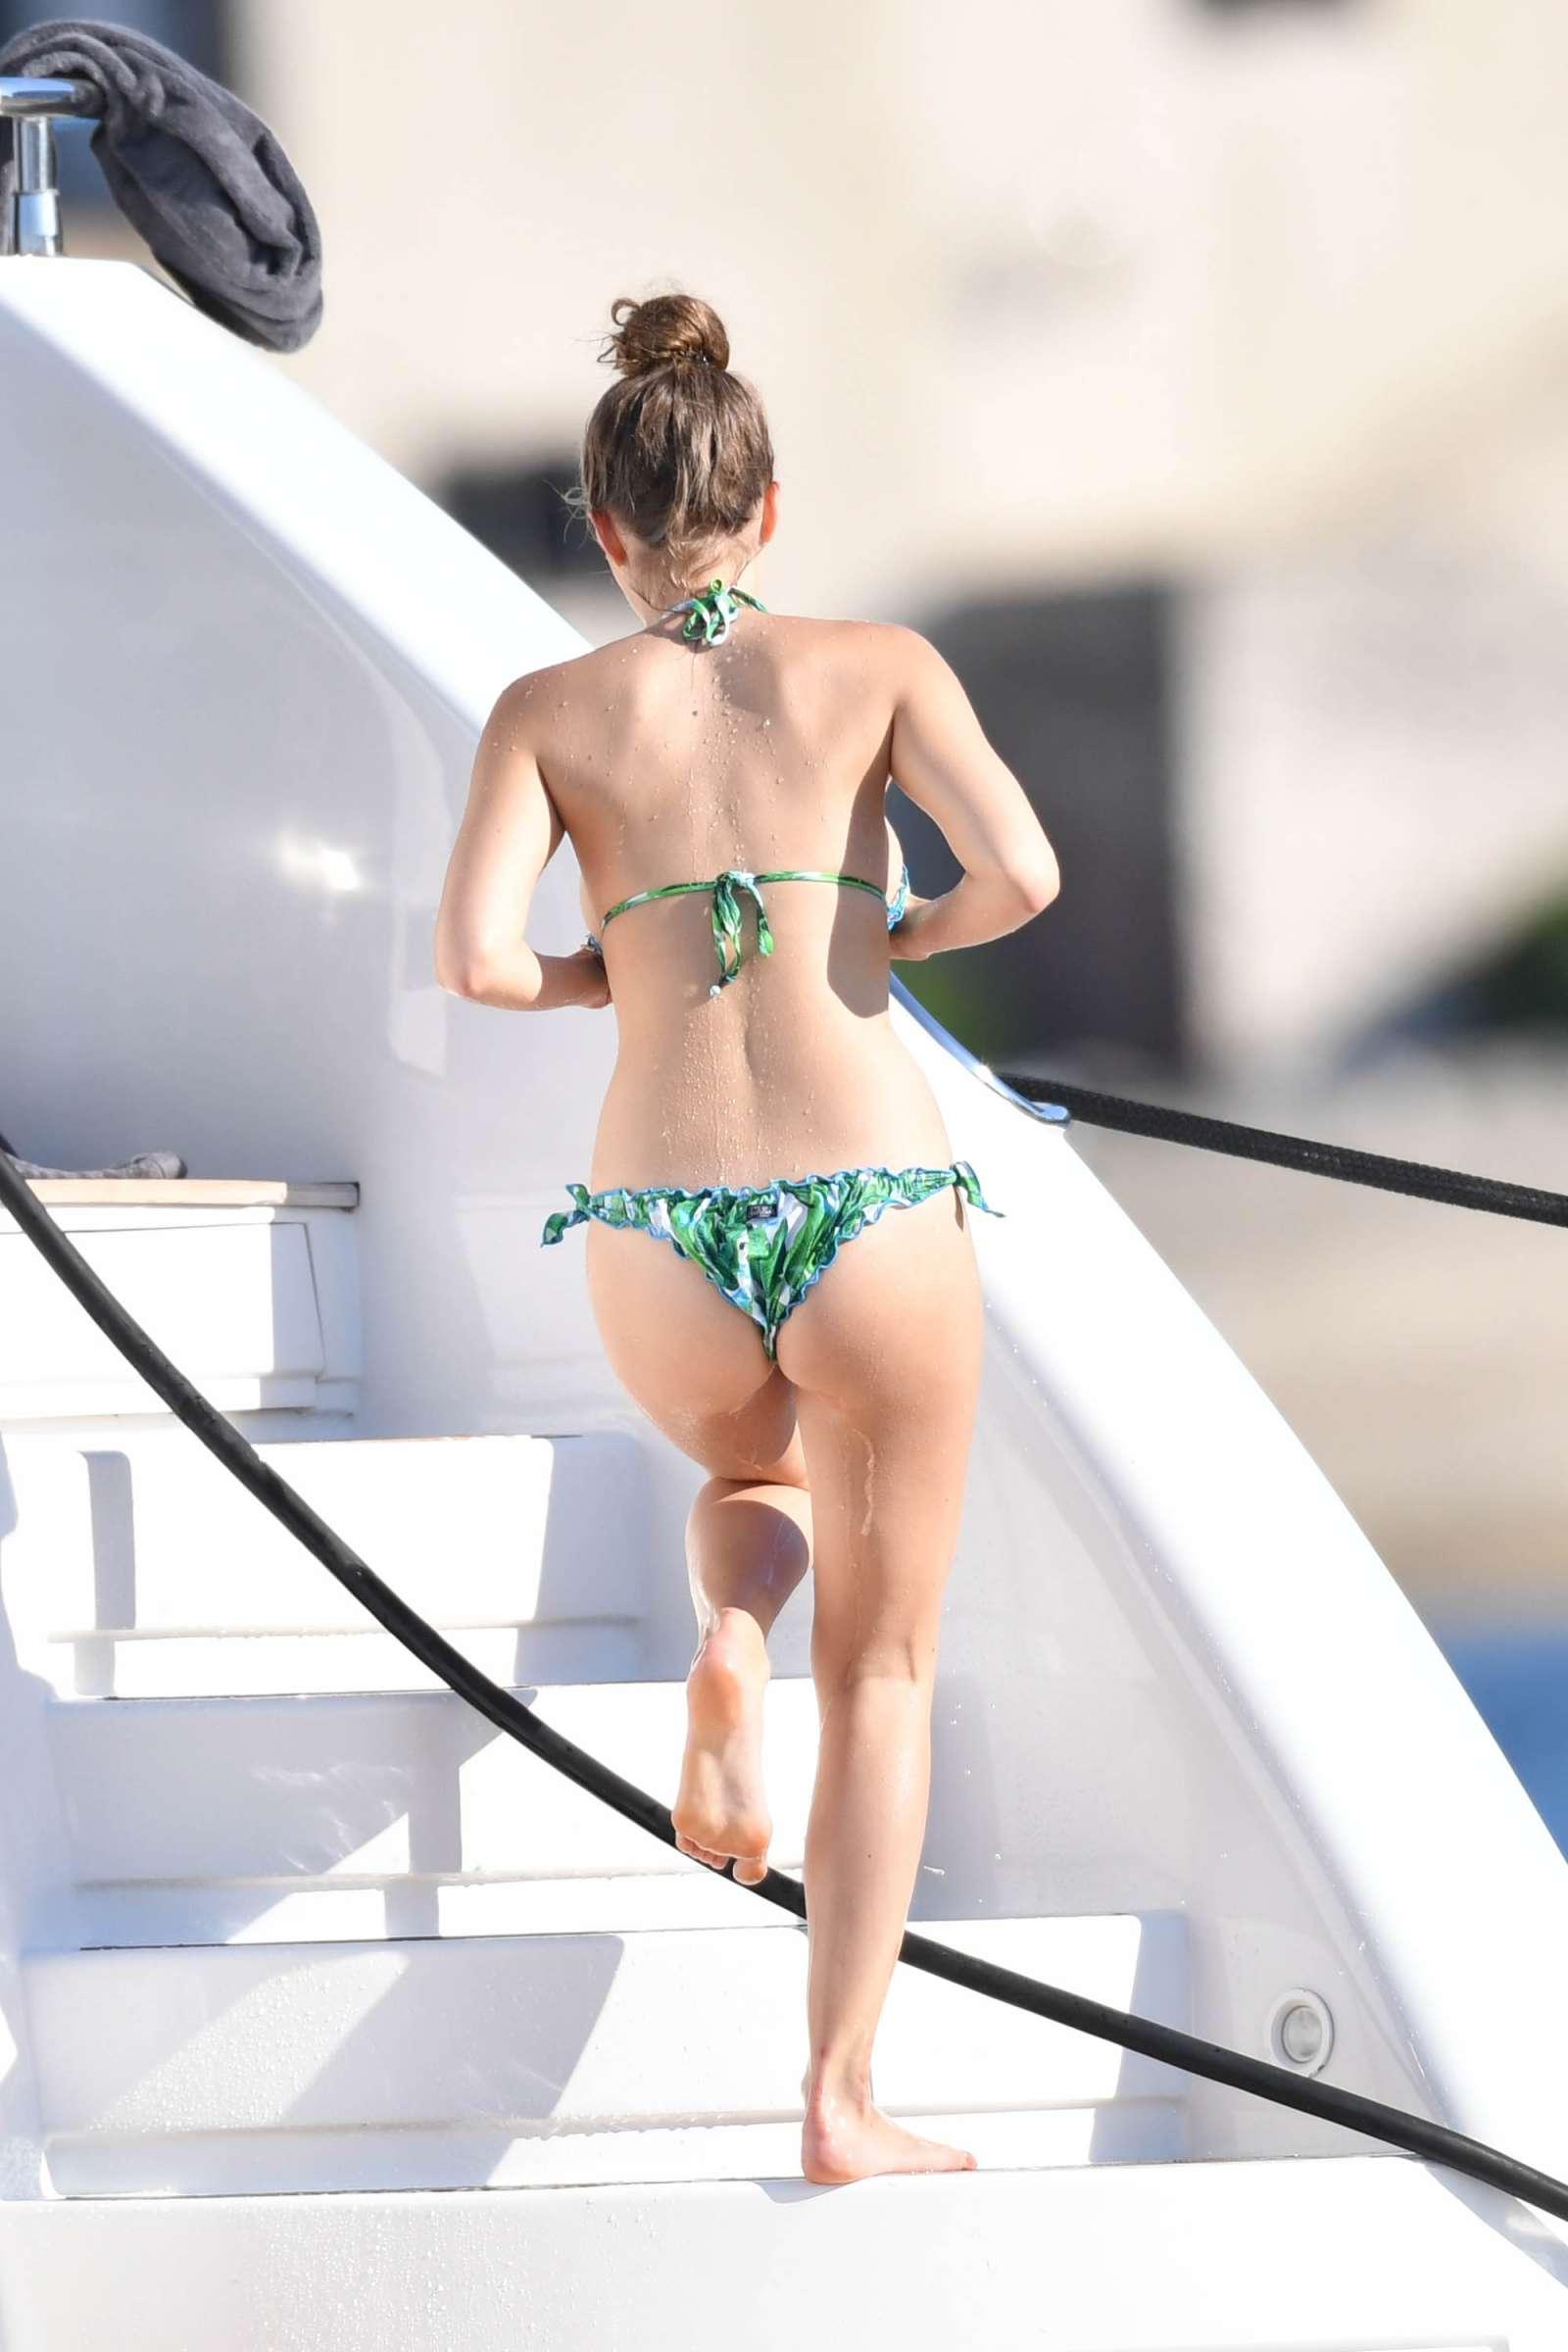 Victoria Swarovski 2017 : Victoria Swarovski in Bikini 2017 -25